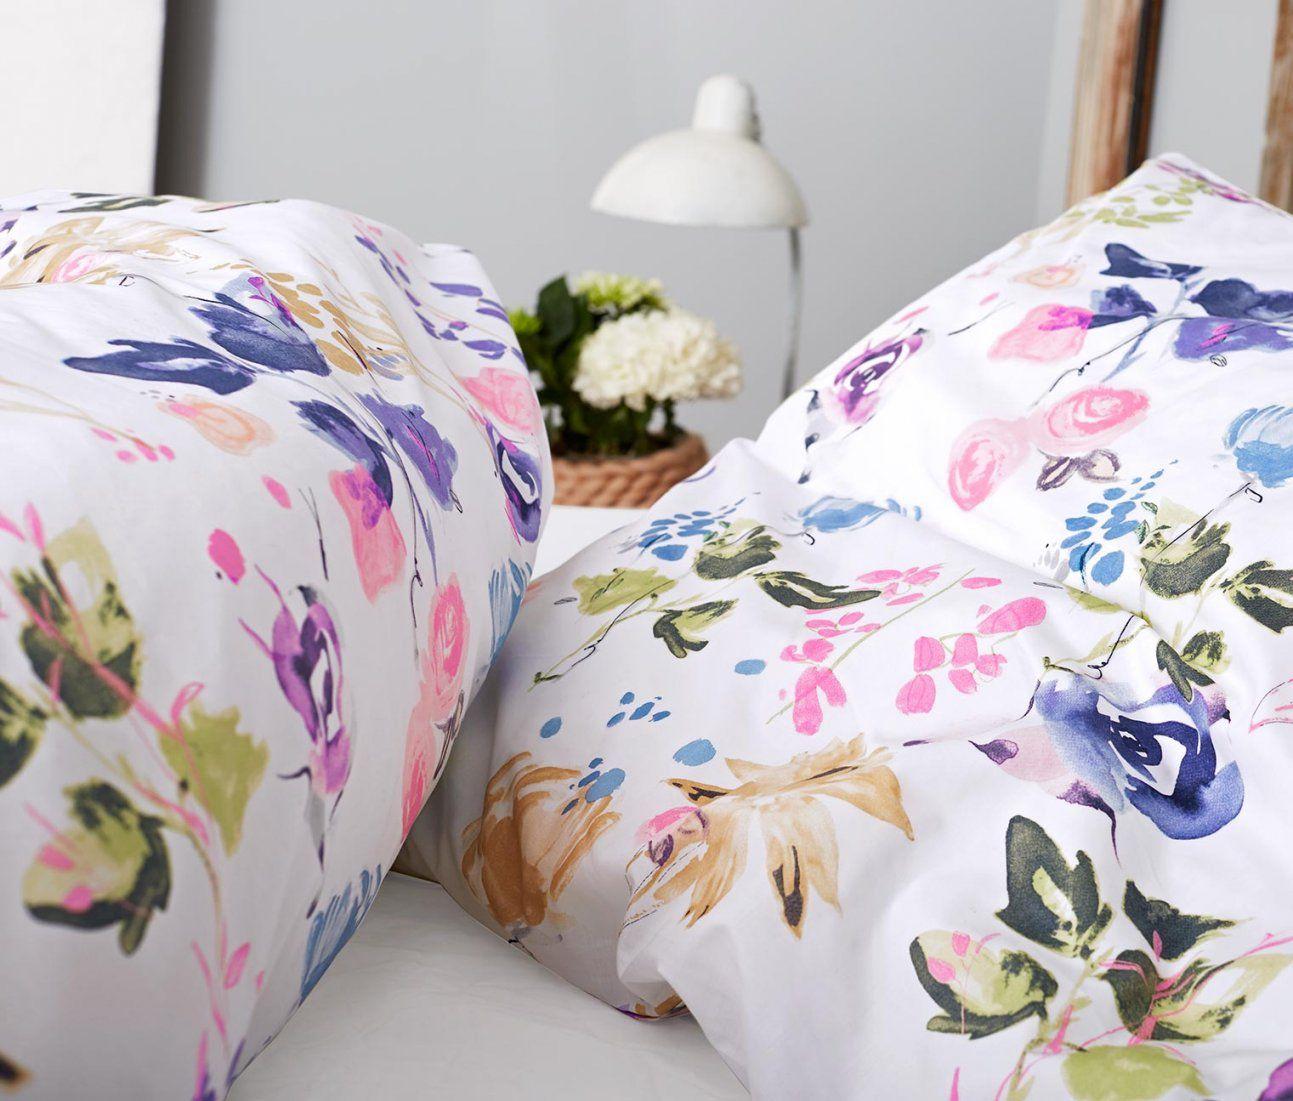 tchibo bettw sche bergr e haus design ideen. Black Bedroom Furniture Sets. Home Design Ideas